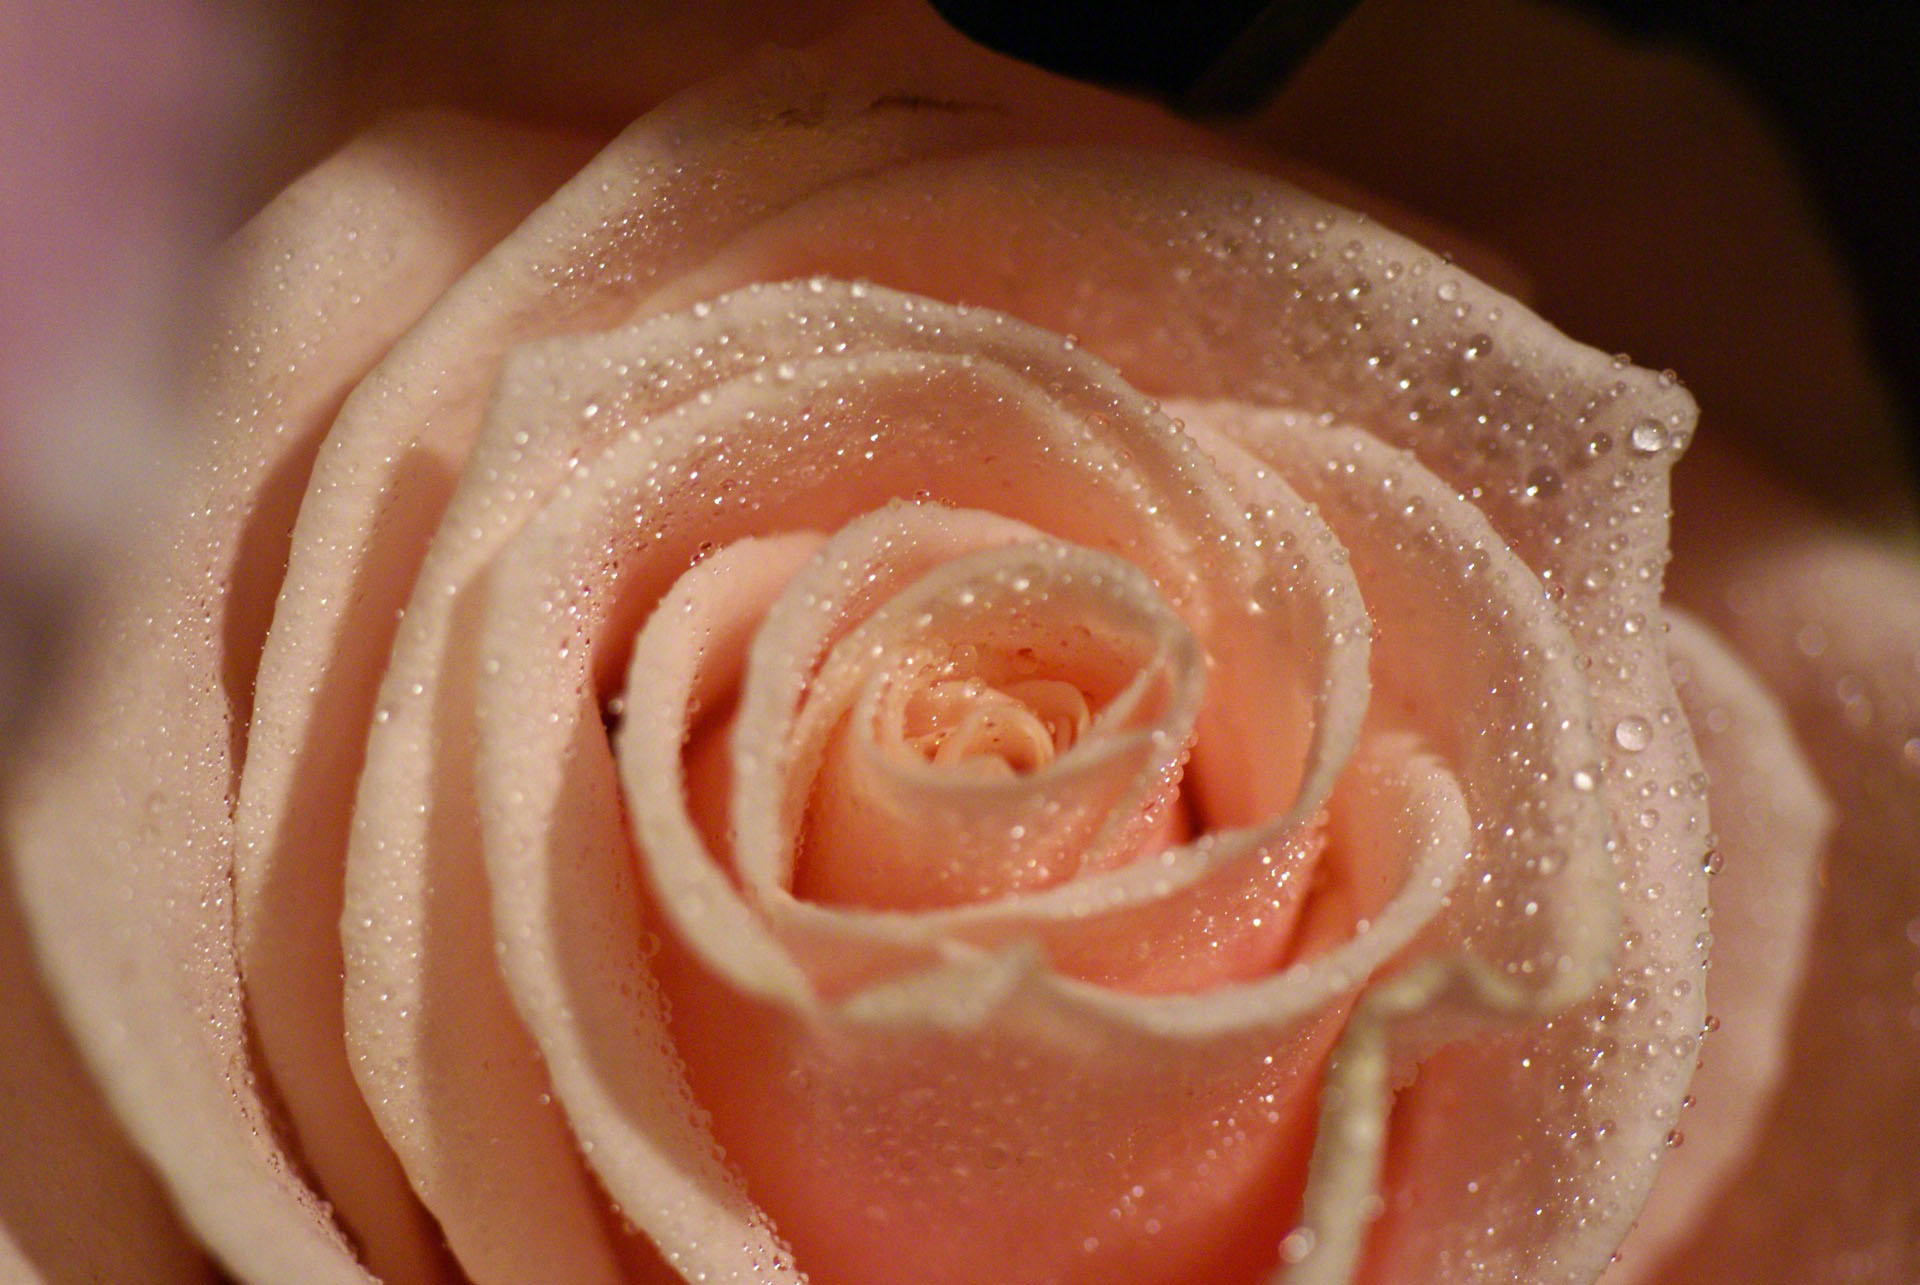 http://www.fabiovisentin.com/photography/photo/12/peach-rose-macro-dsc01212.jpg